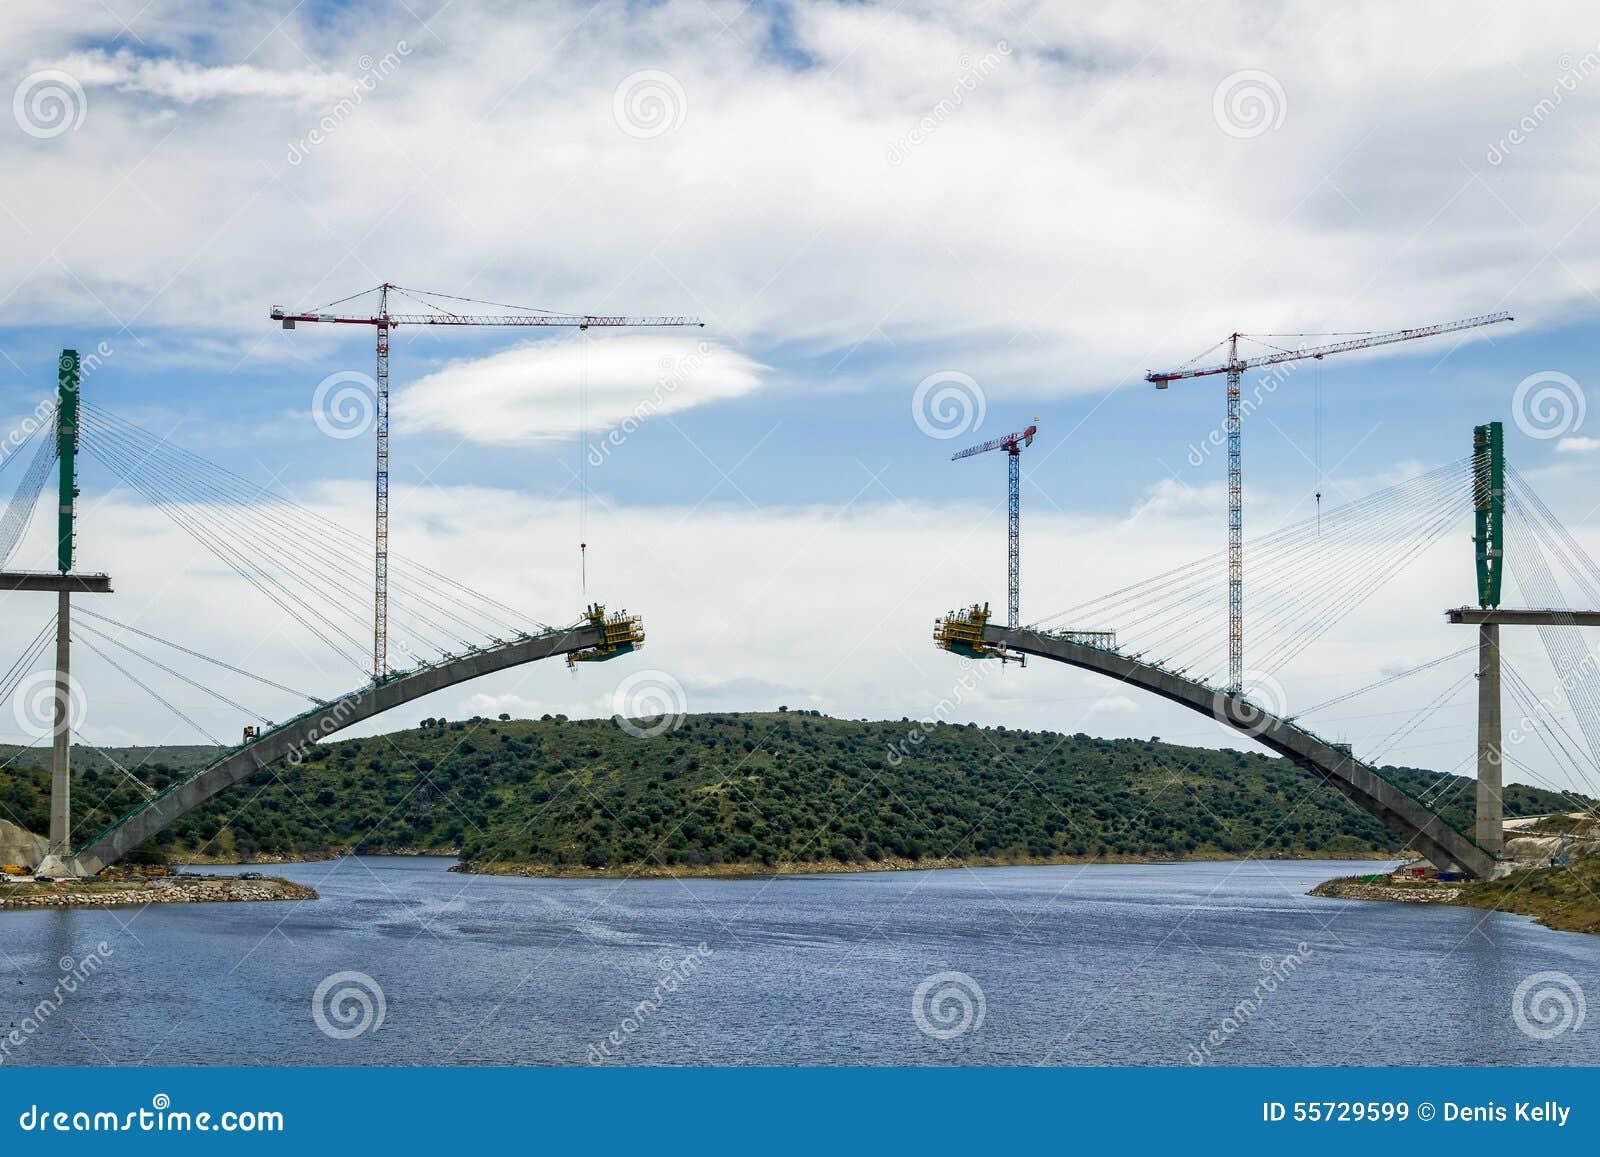 Download River Railway Bridge Under Construction In Spain Stock Image - Image of river, deck: 55729599